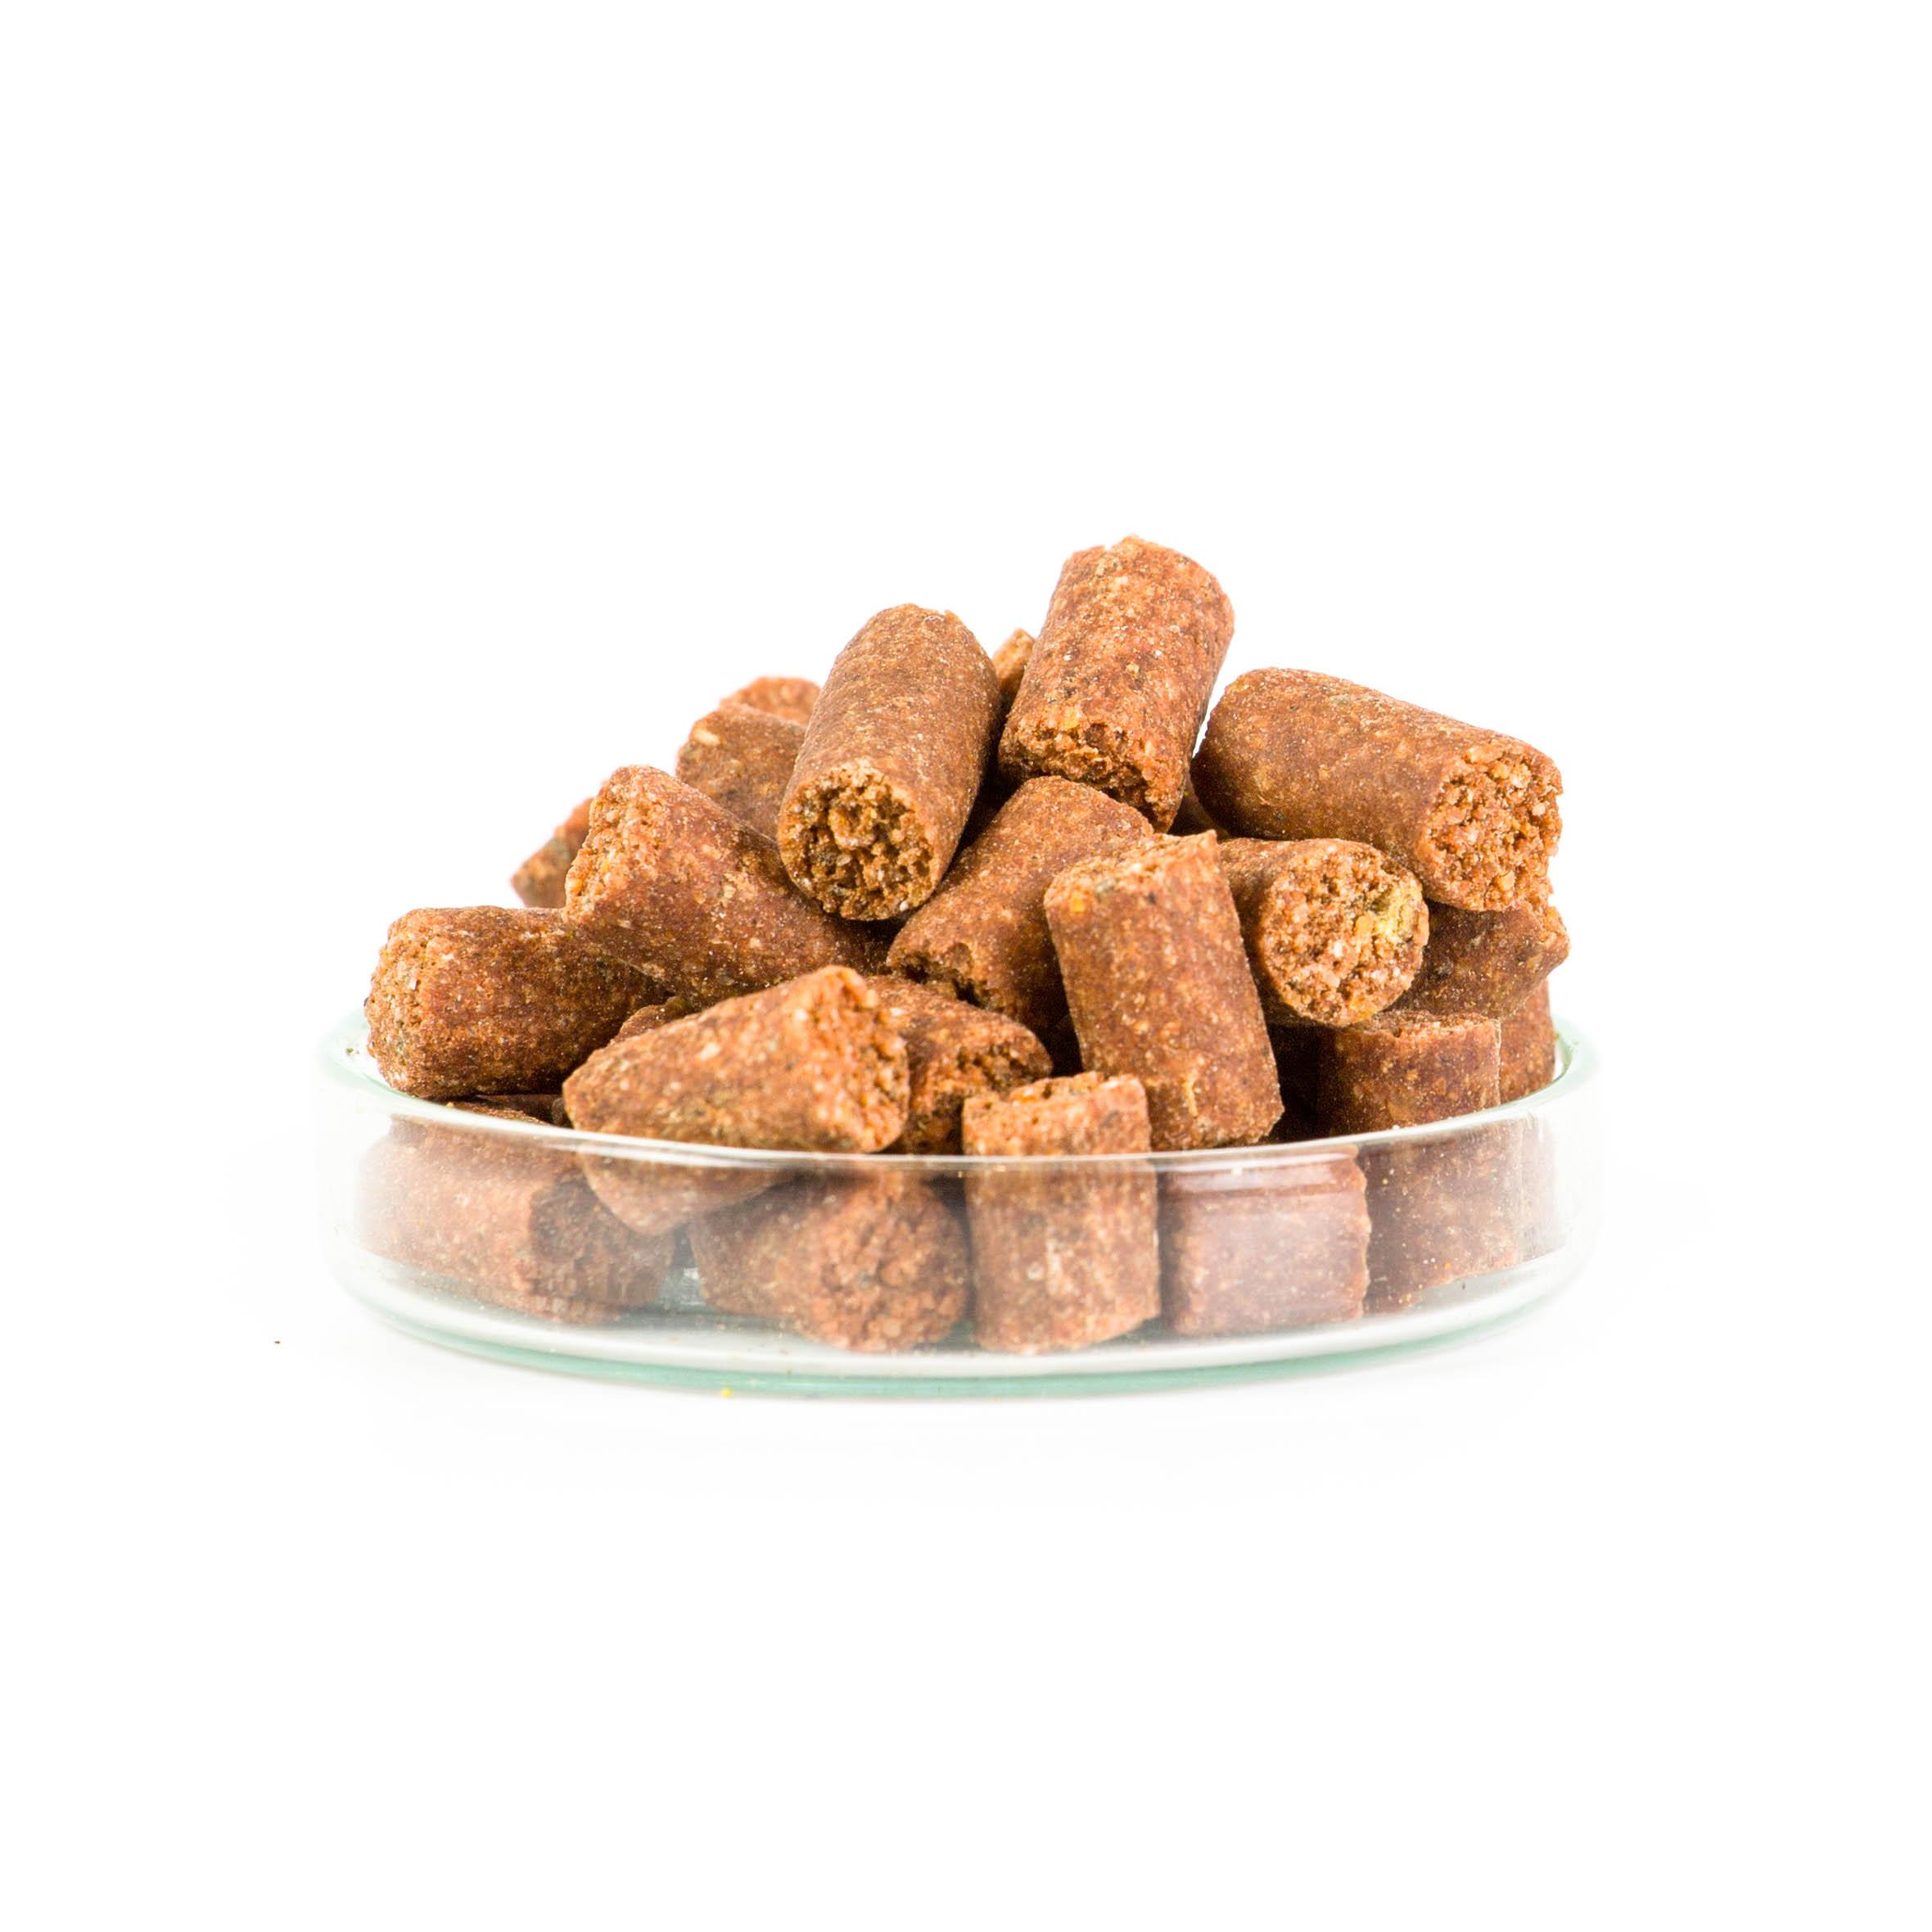 Spiceman pelety 1kg - Pikantní švestka 6mm